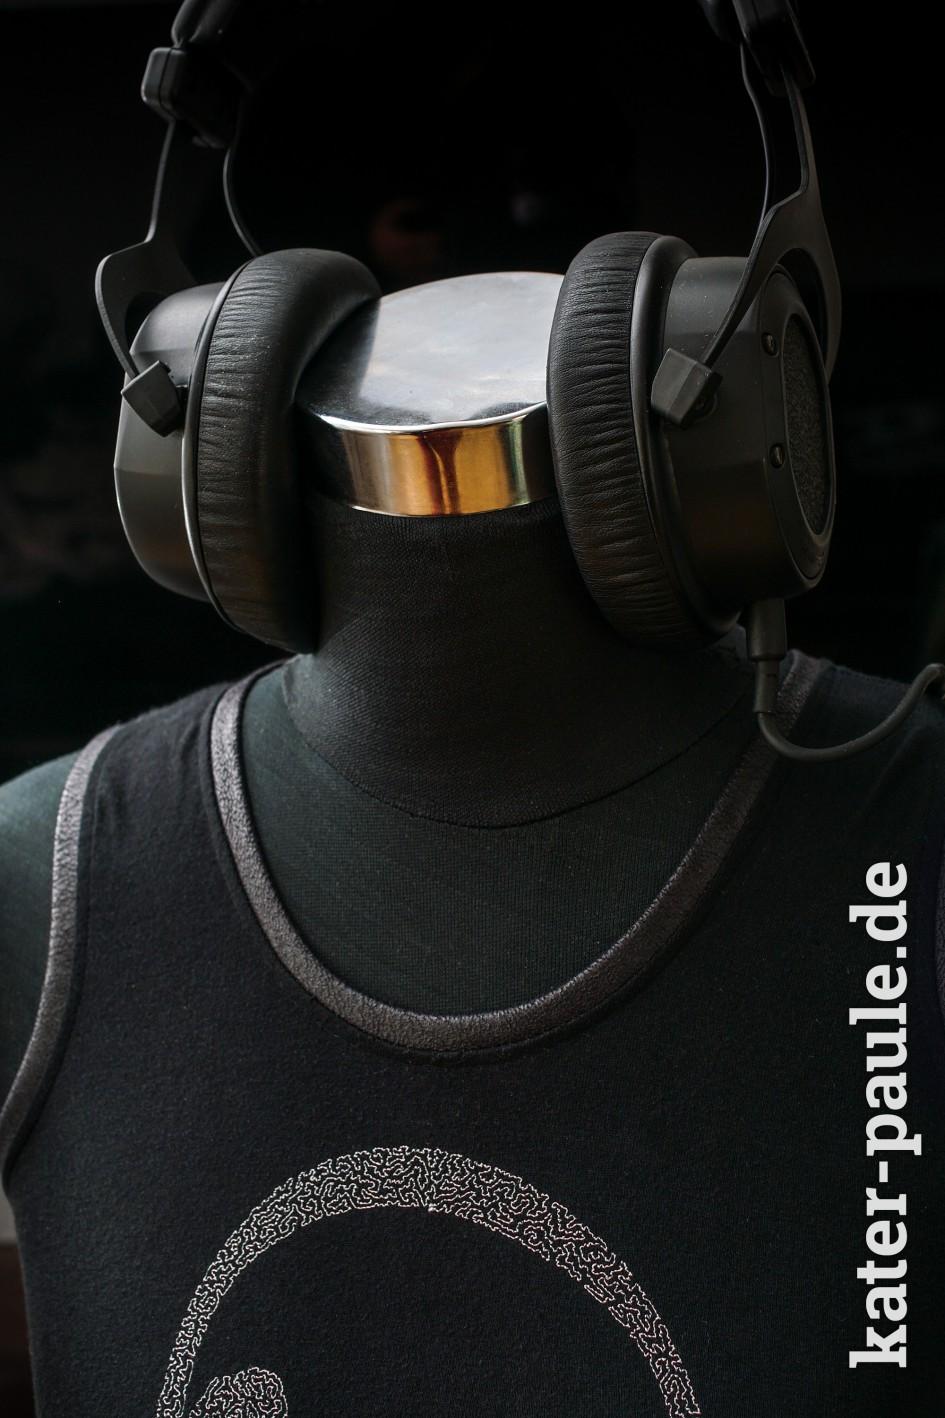 Neonwild Kopfhörer Tanktop - Lederjersey